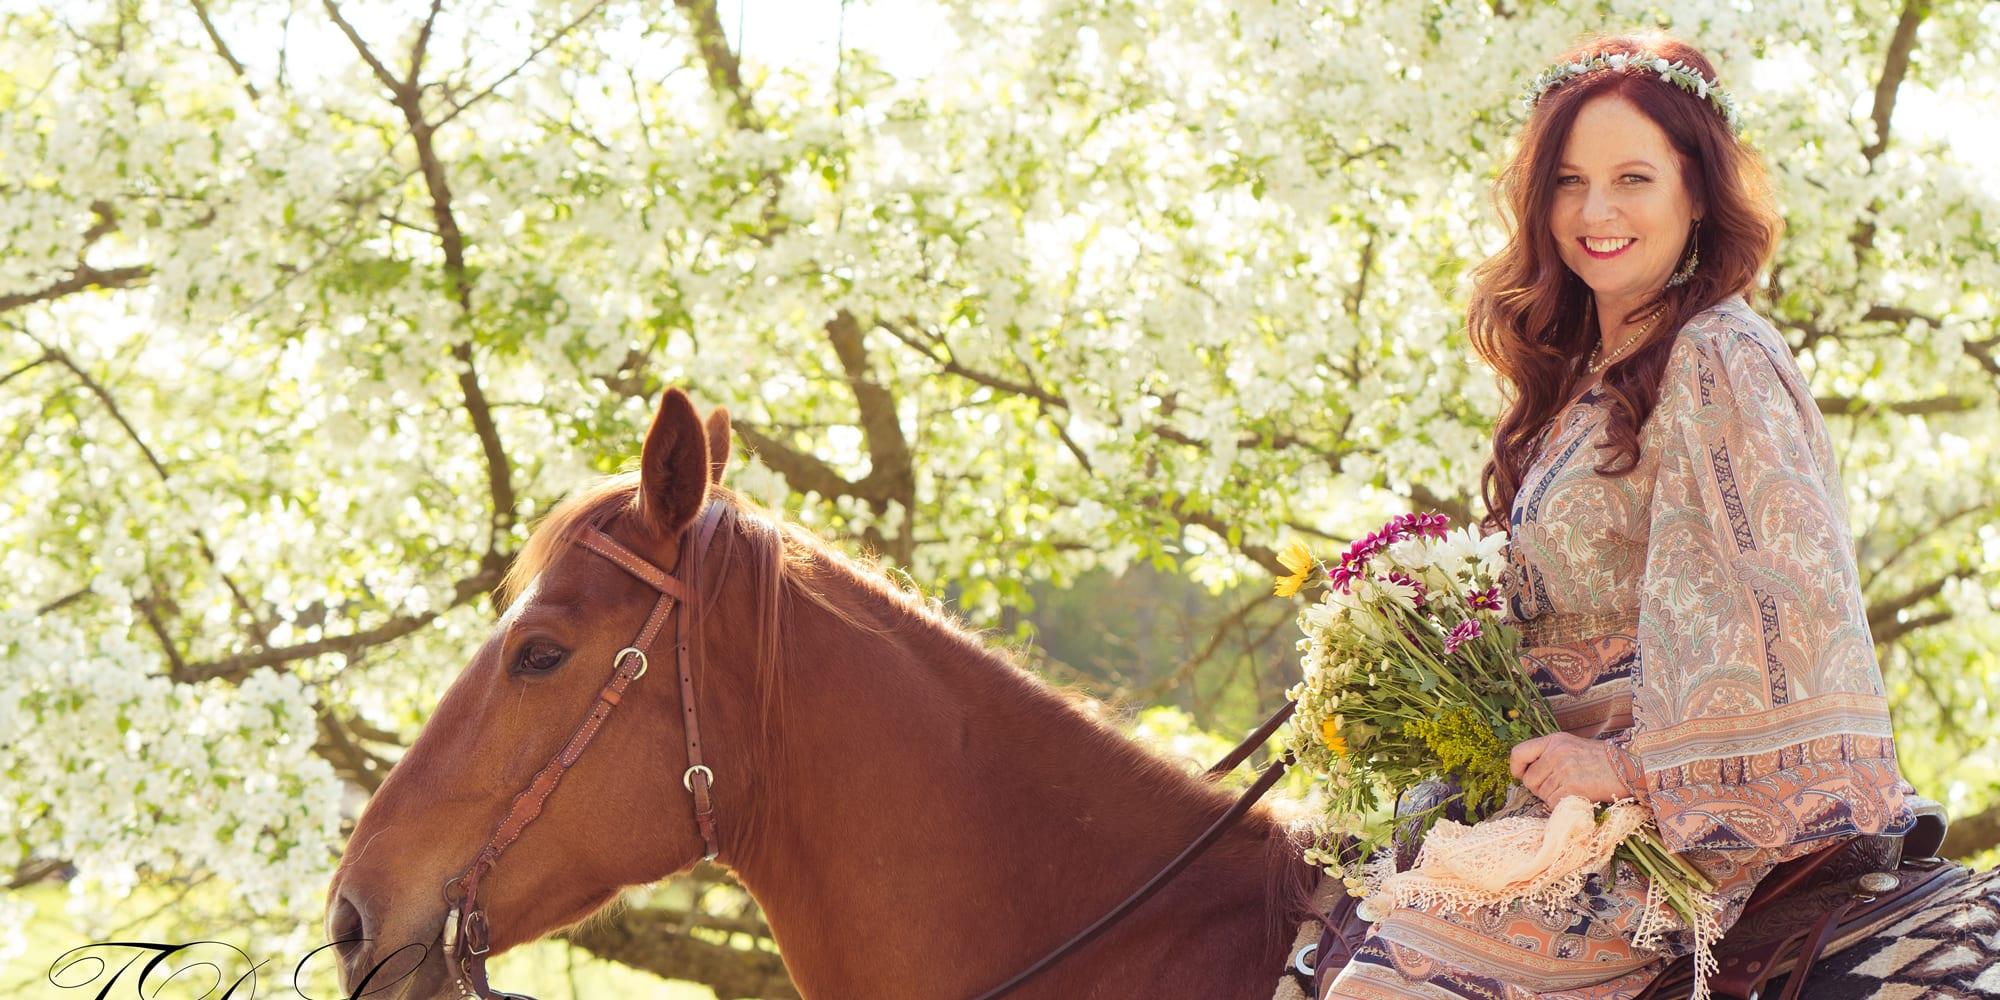 Julie on Horseback - Julie Ann Rose, Restoring the Heart